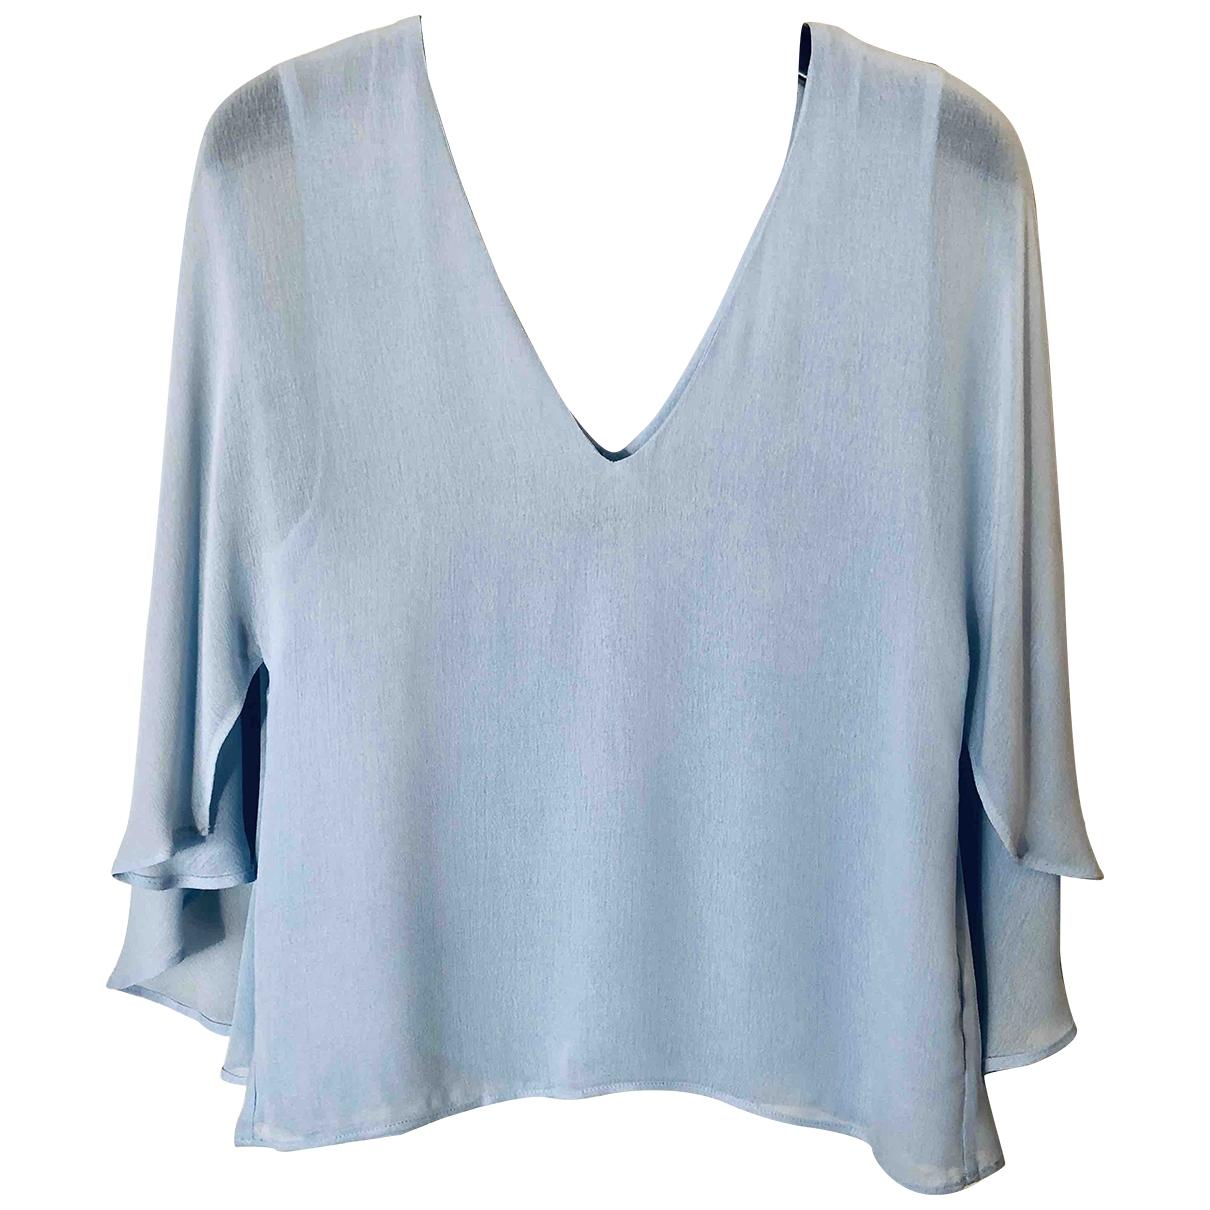 Zara \N Blue  top for Women S International